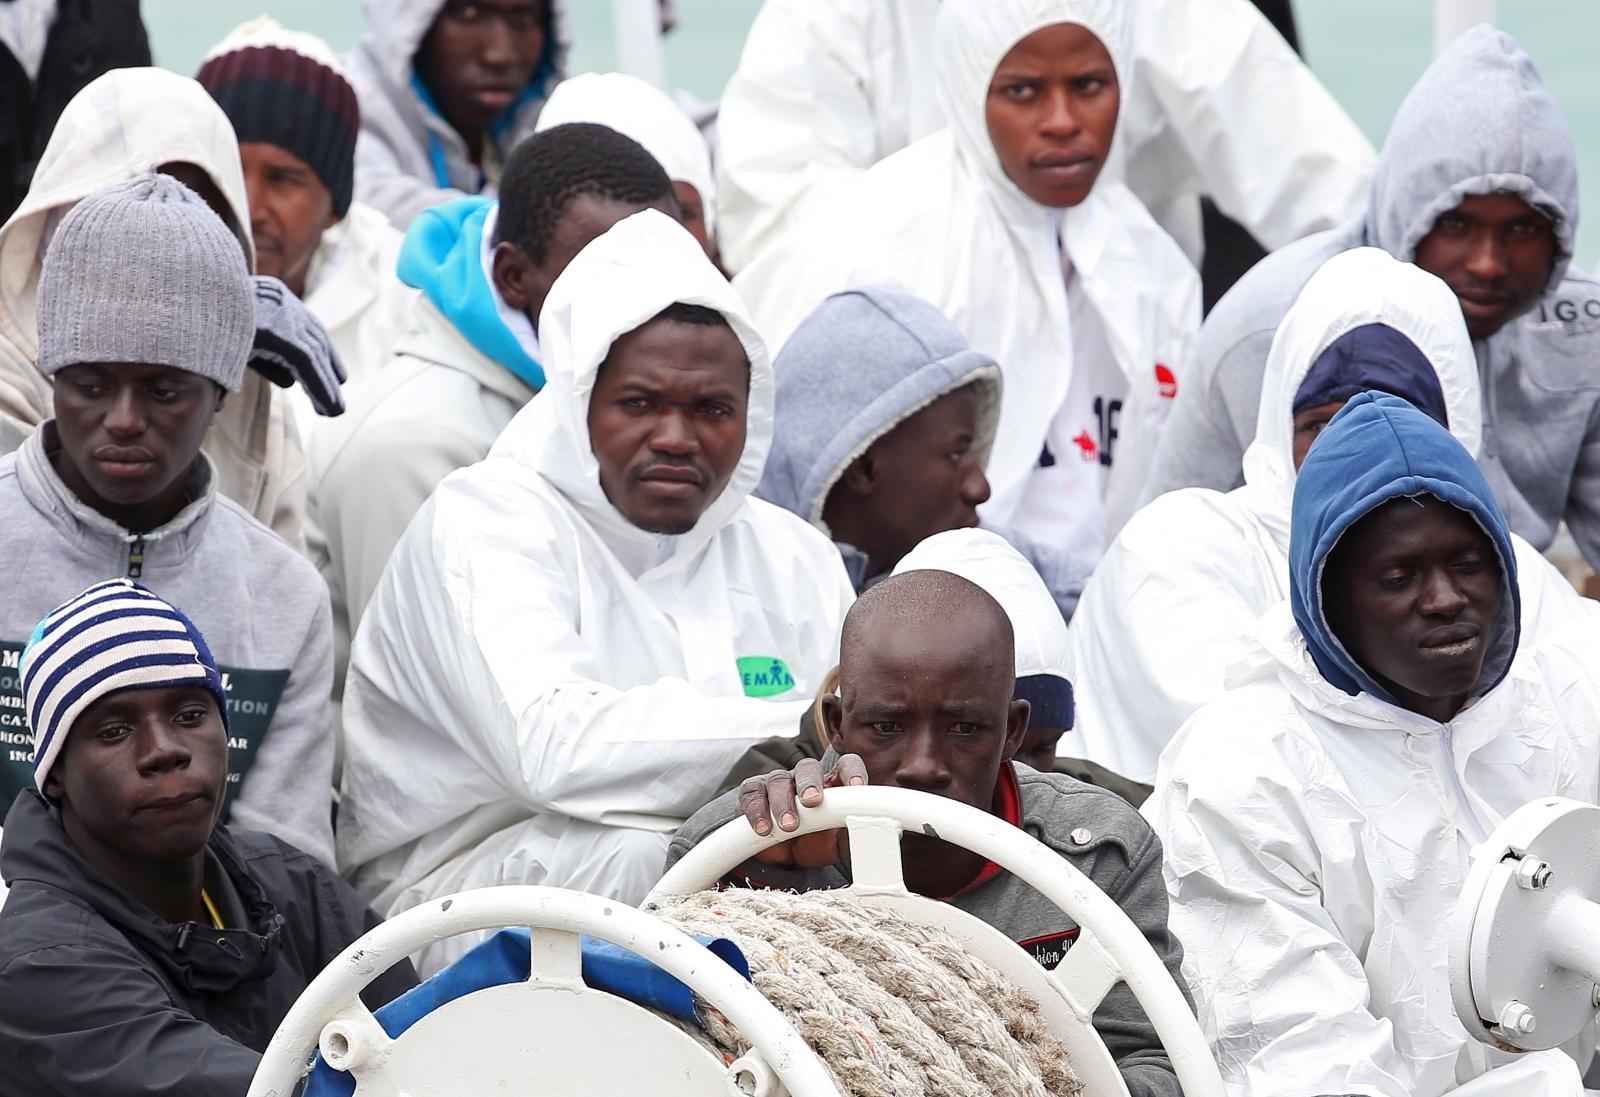 Migrants wait to disembark in Catania